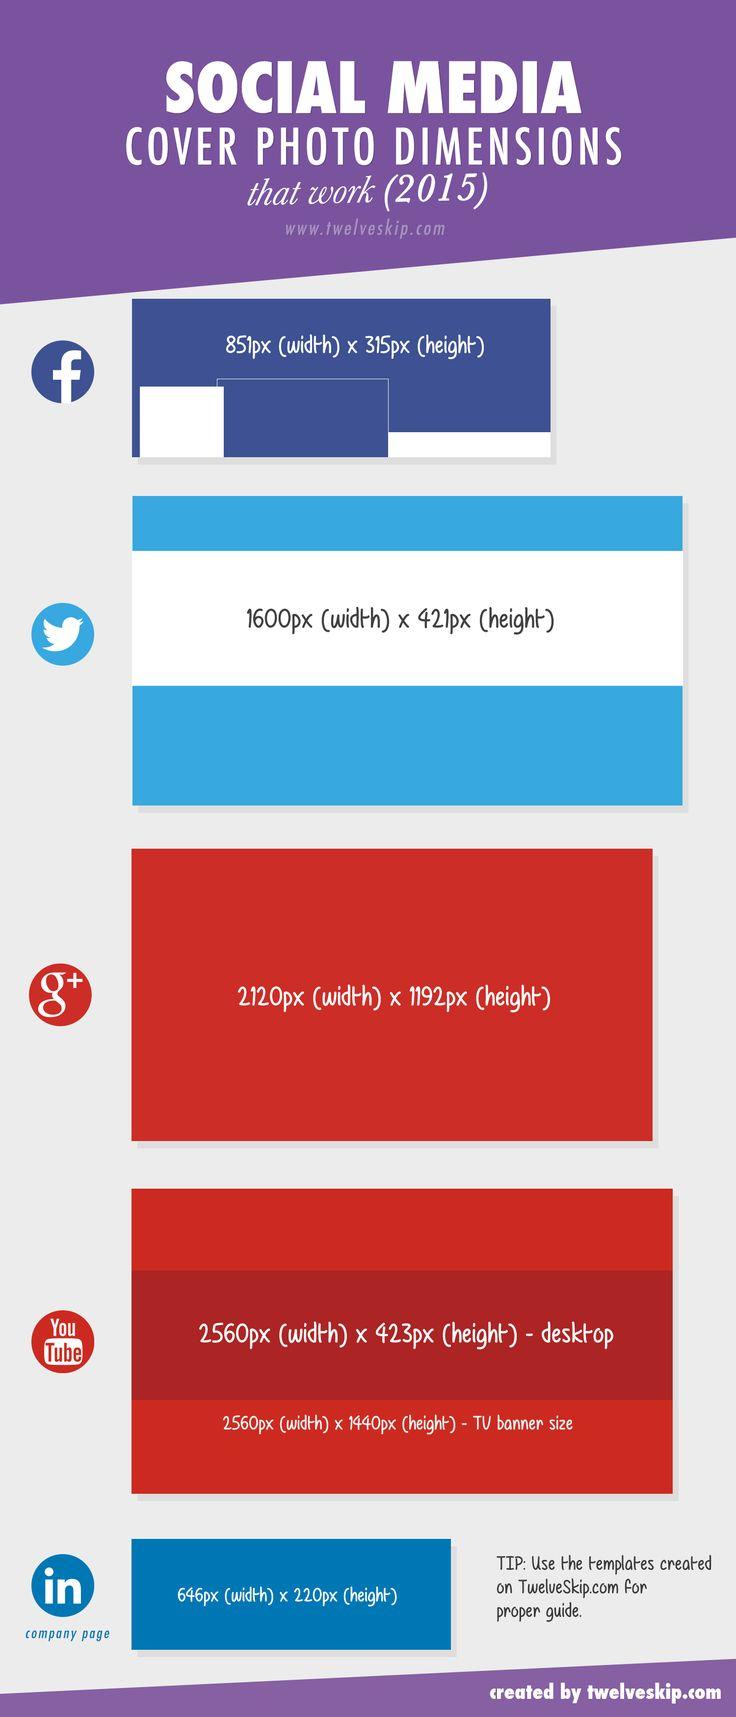 Social Media Image Dimensions 2015